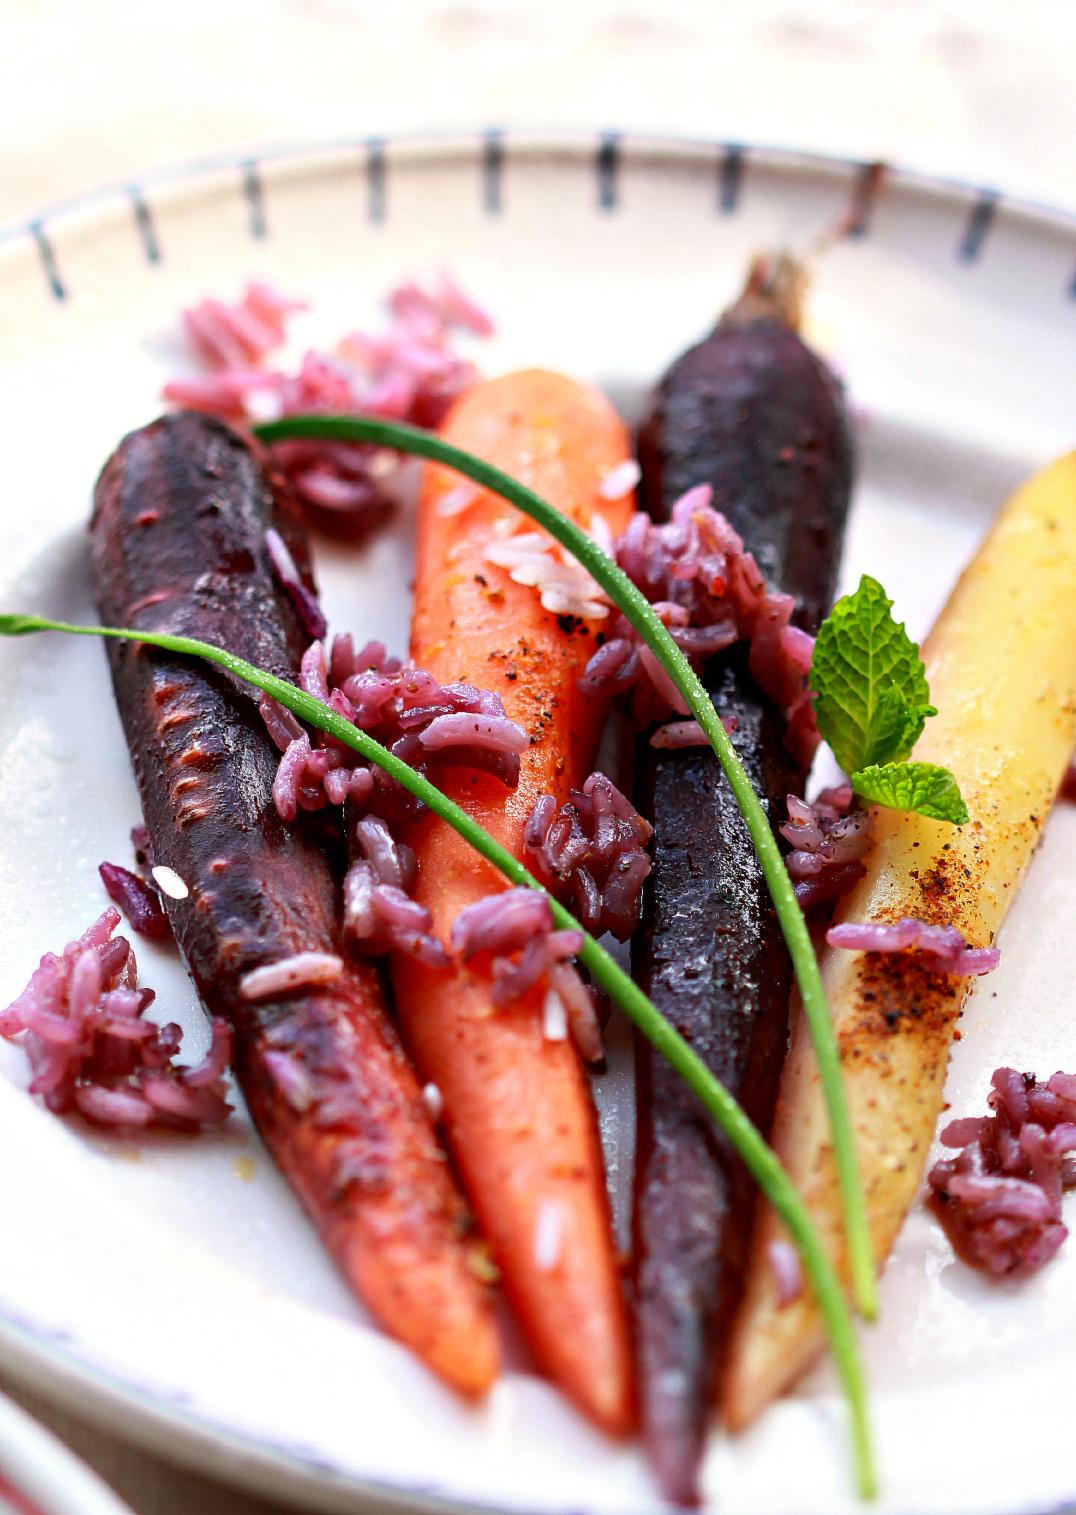 ©Braised Carrots by Dena Testa Bray